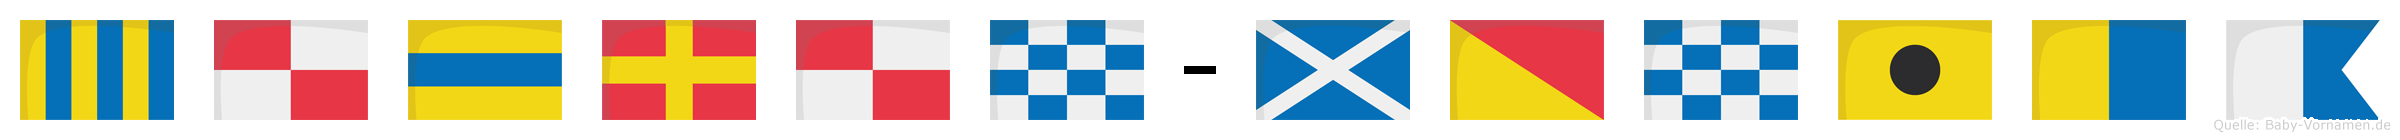 Gudrun-Monika im Flaggenalphabet